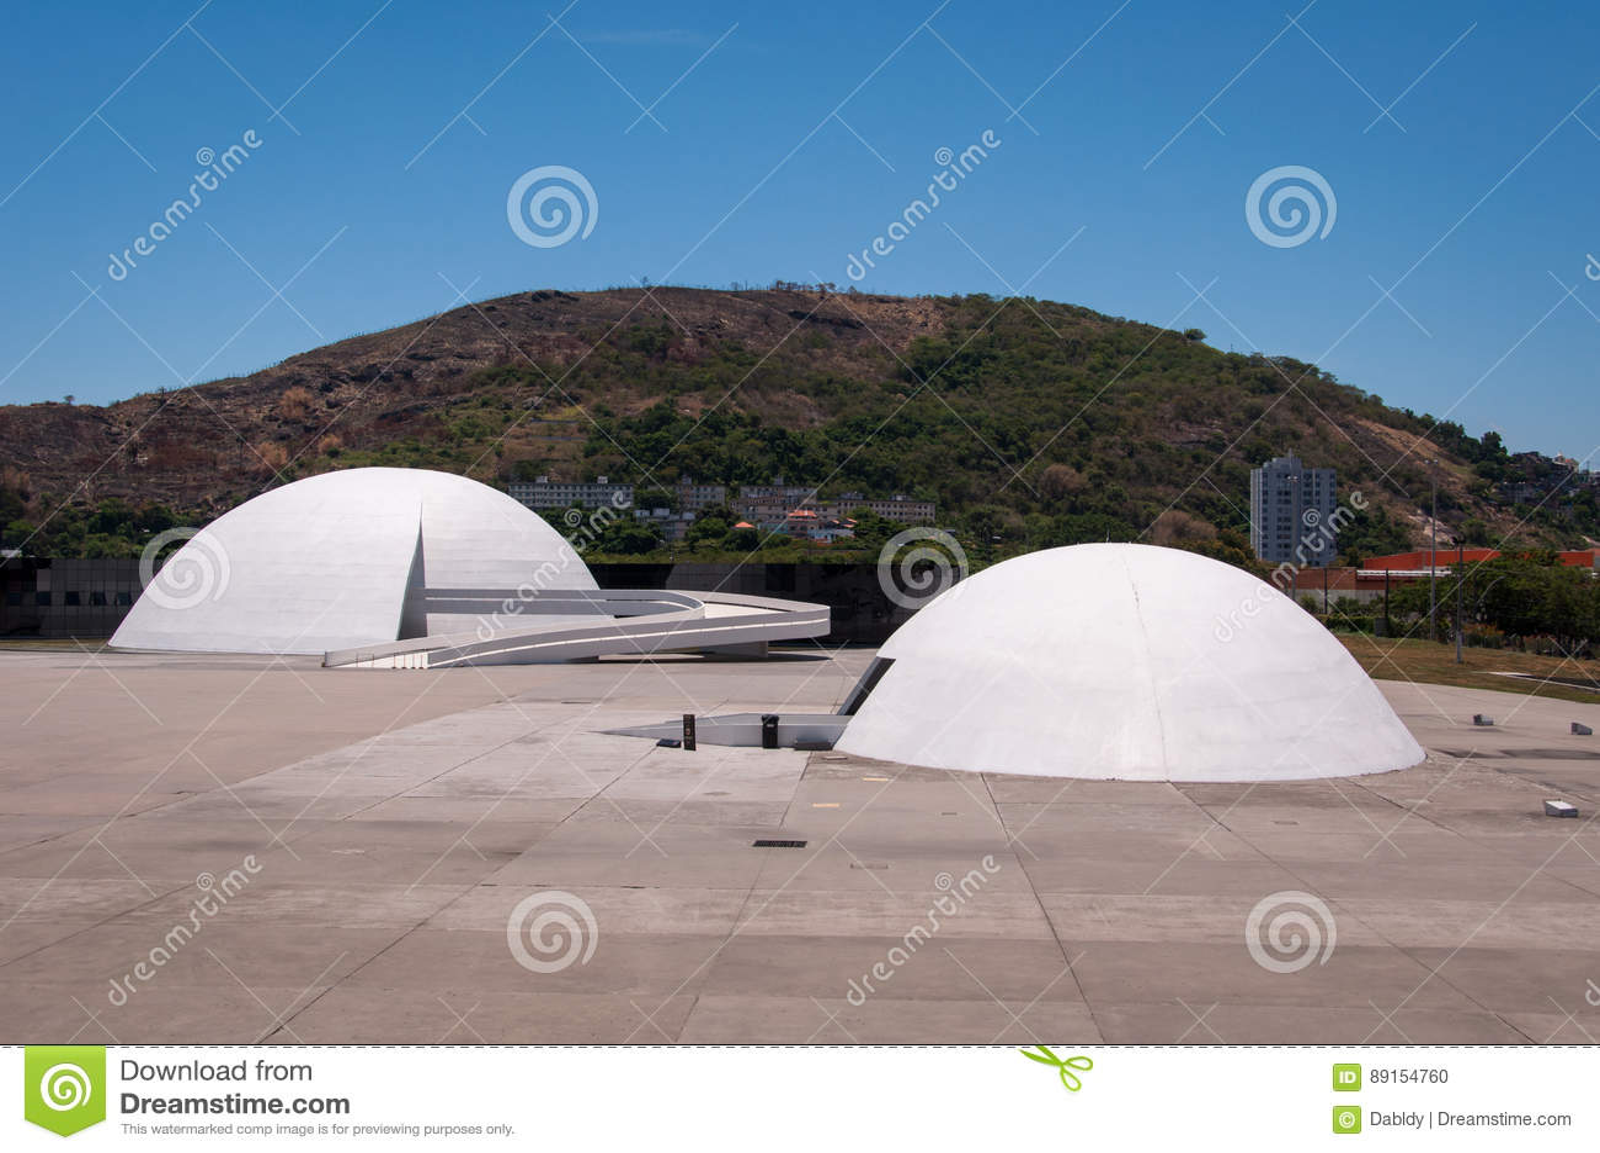 Proyecto besides Ibug 003 0005 besides Fullsize as well Uk furthermore Editorial Stock Image Oscar Niemeyer Museum Curitiba Pr Brazil Paran Image46220819. on oscar niemeyer international cultural centre